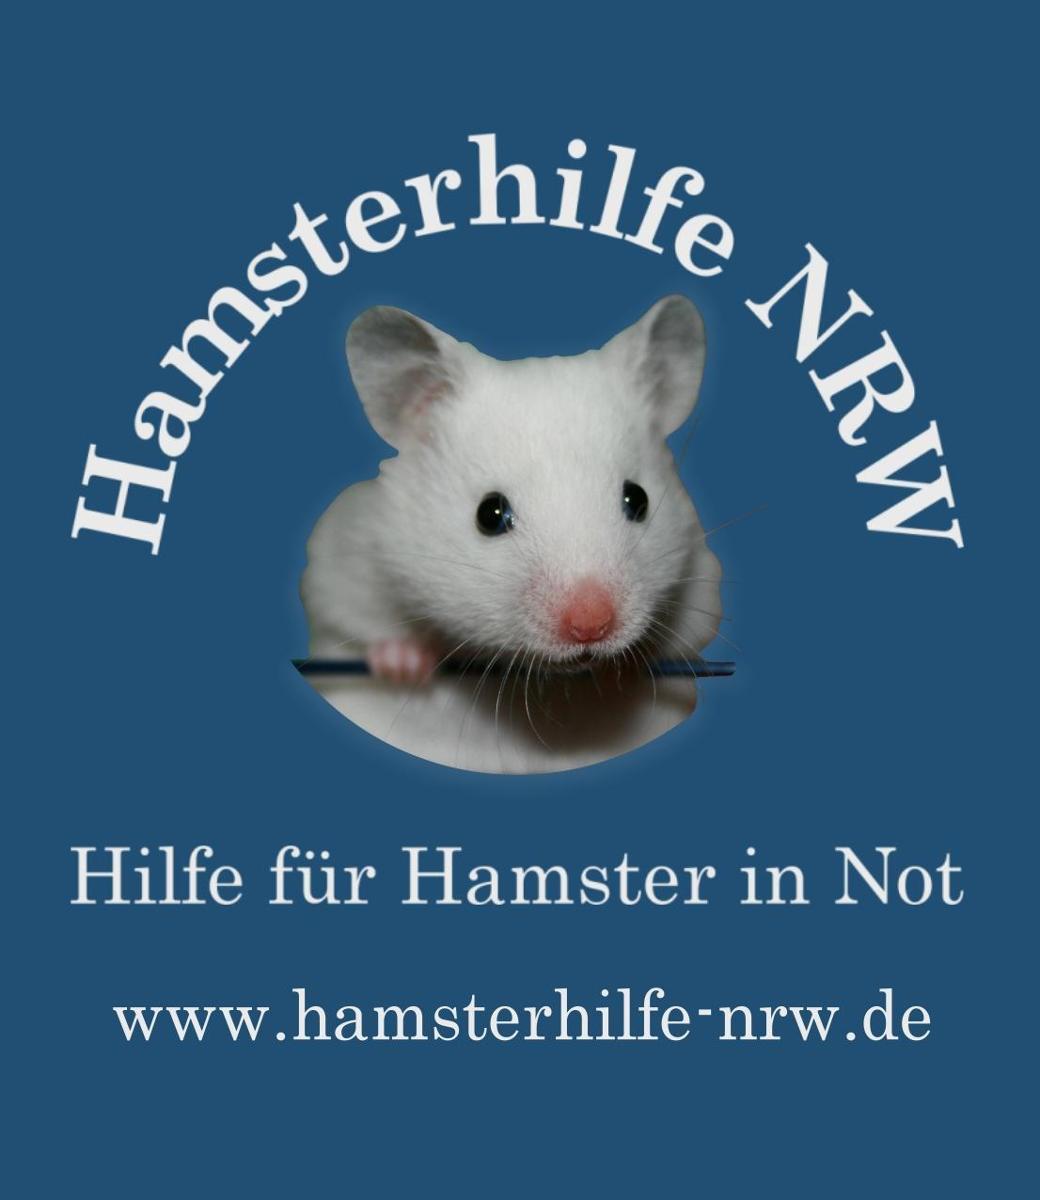 Hamsterhilfe NRW e.V.